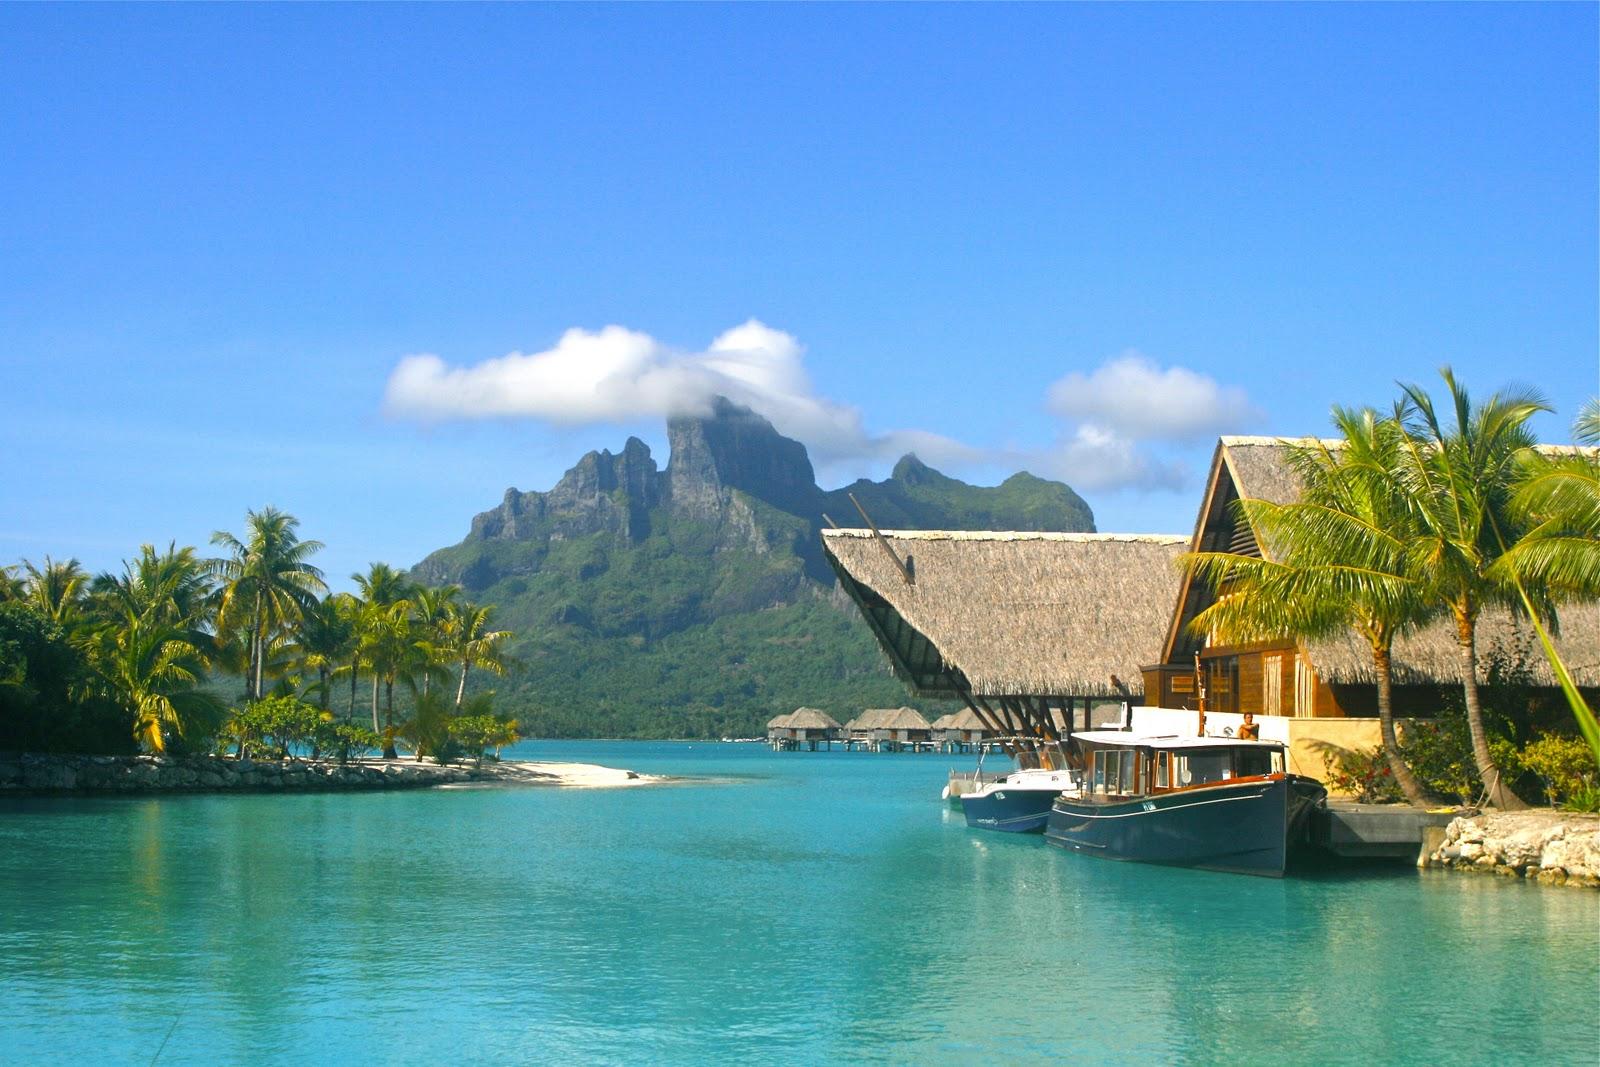 Coral Reef Wallpaper Hd Four Seasons Resort Bora Bora French Polynesia